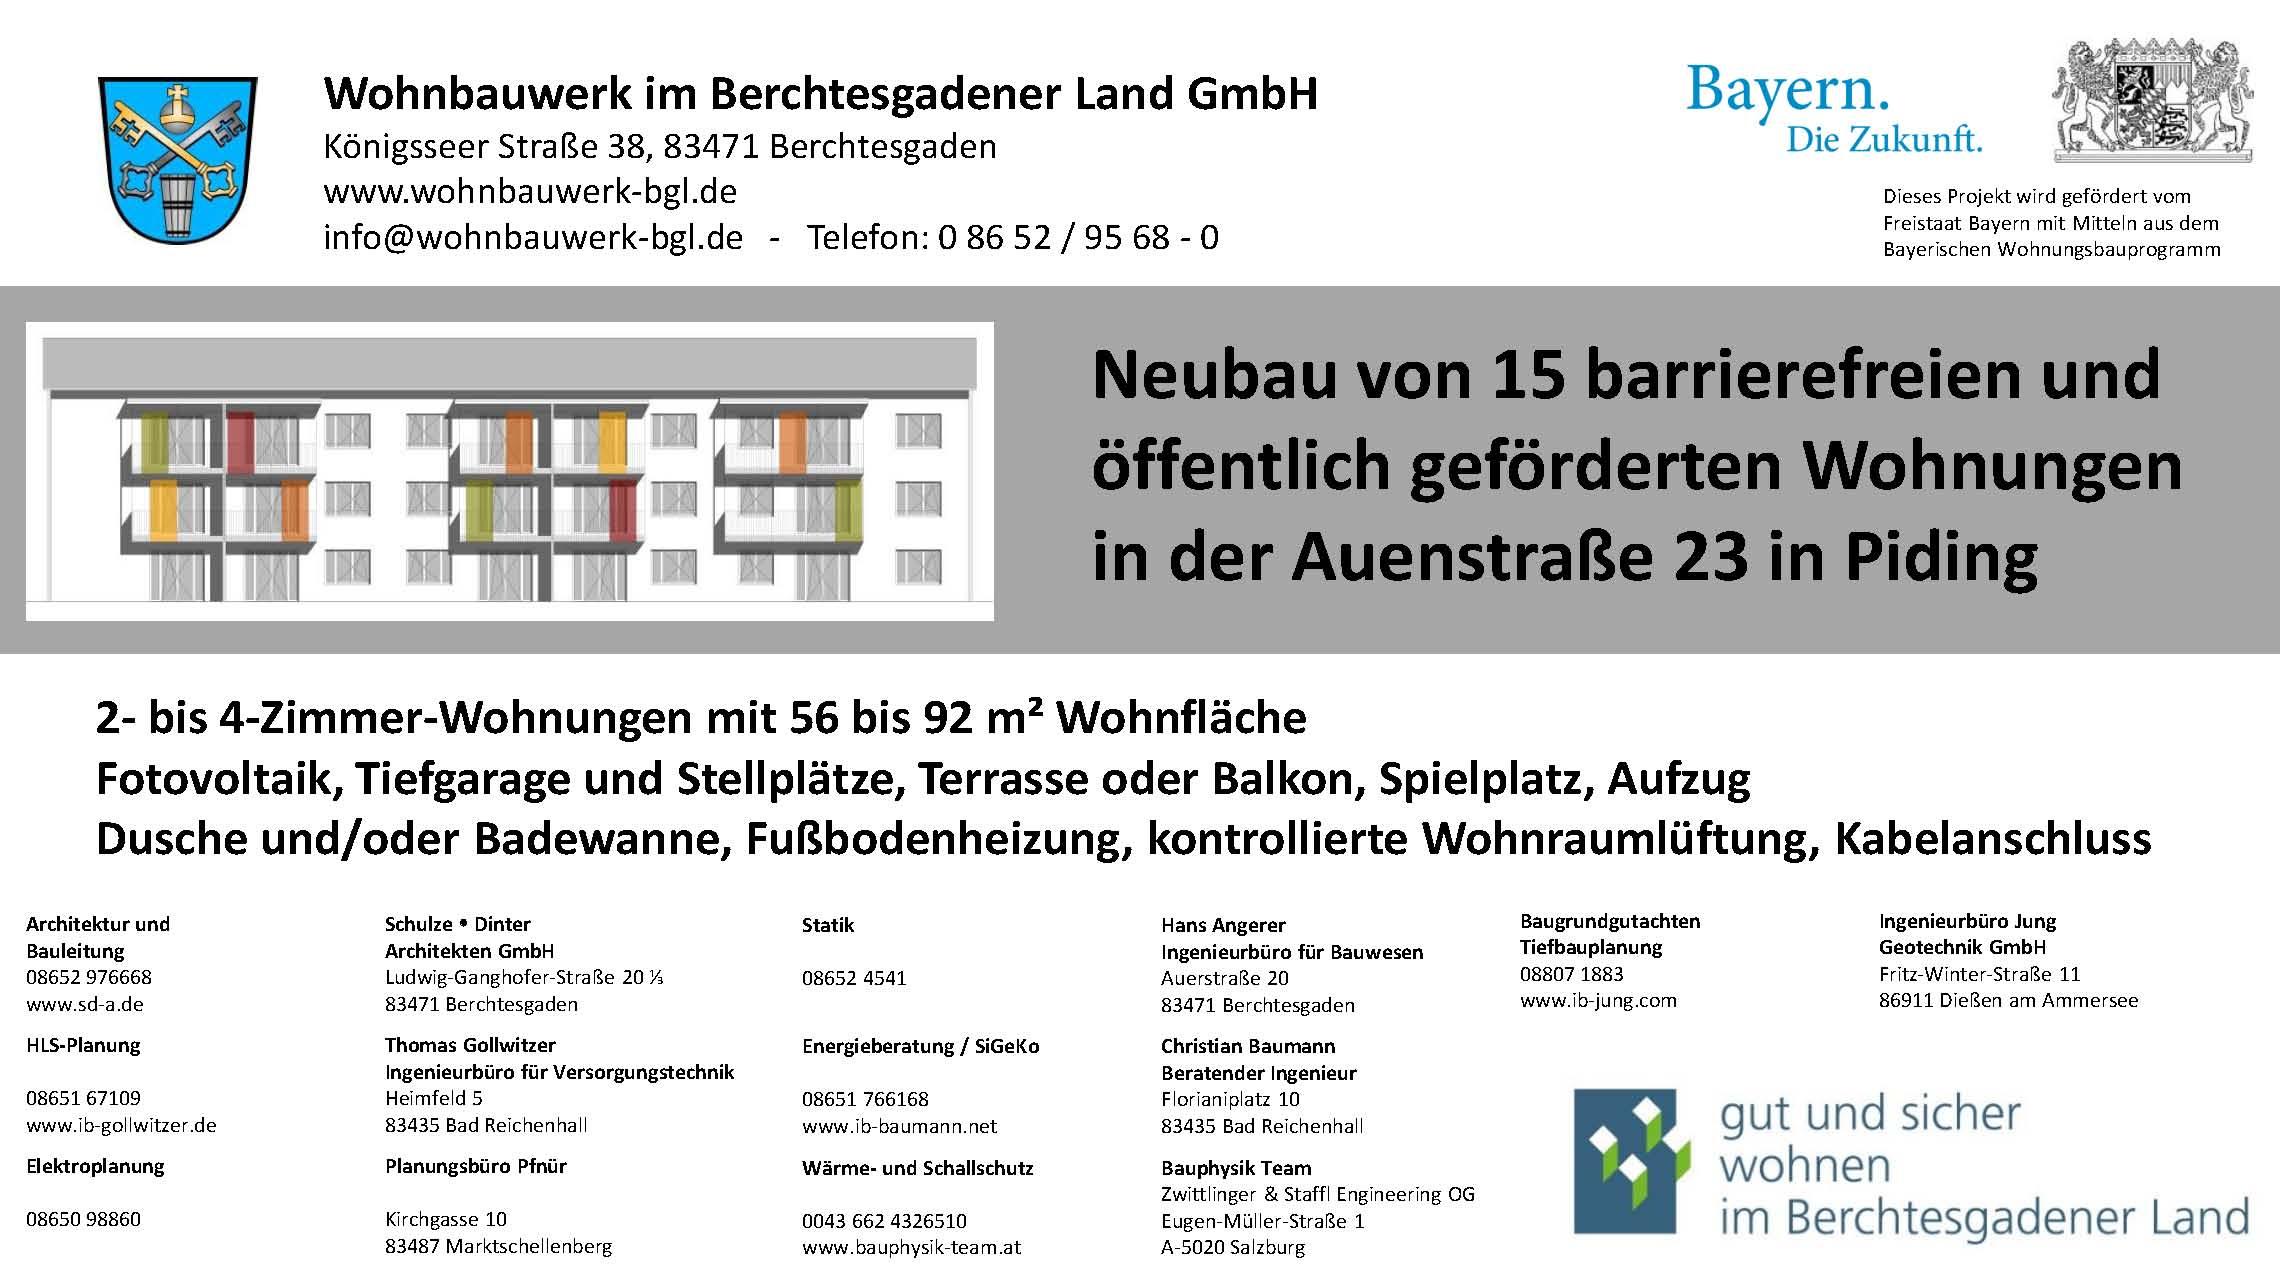 Bautafel Auenstraße 23 Piding